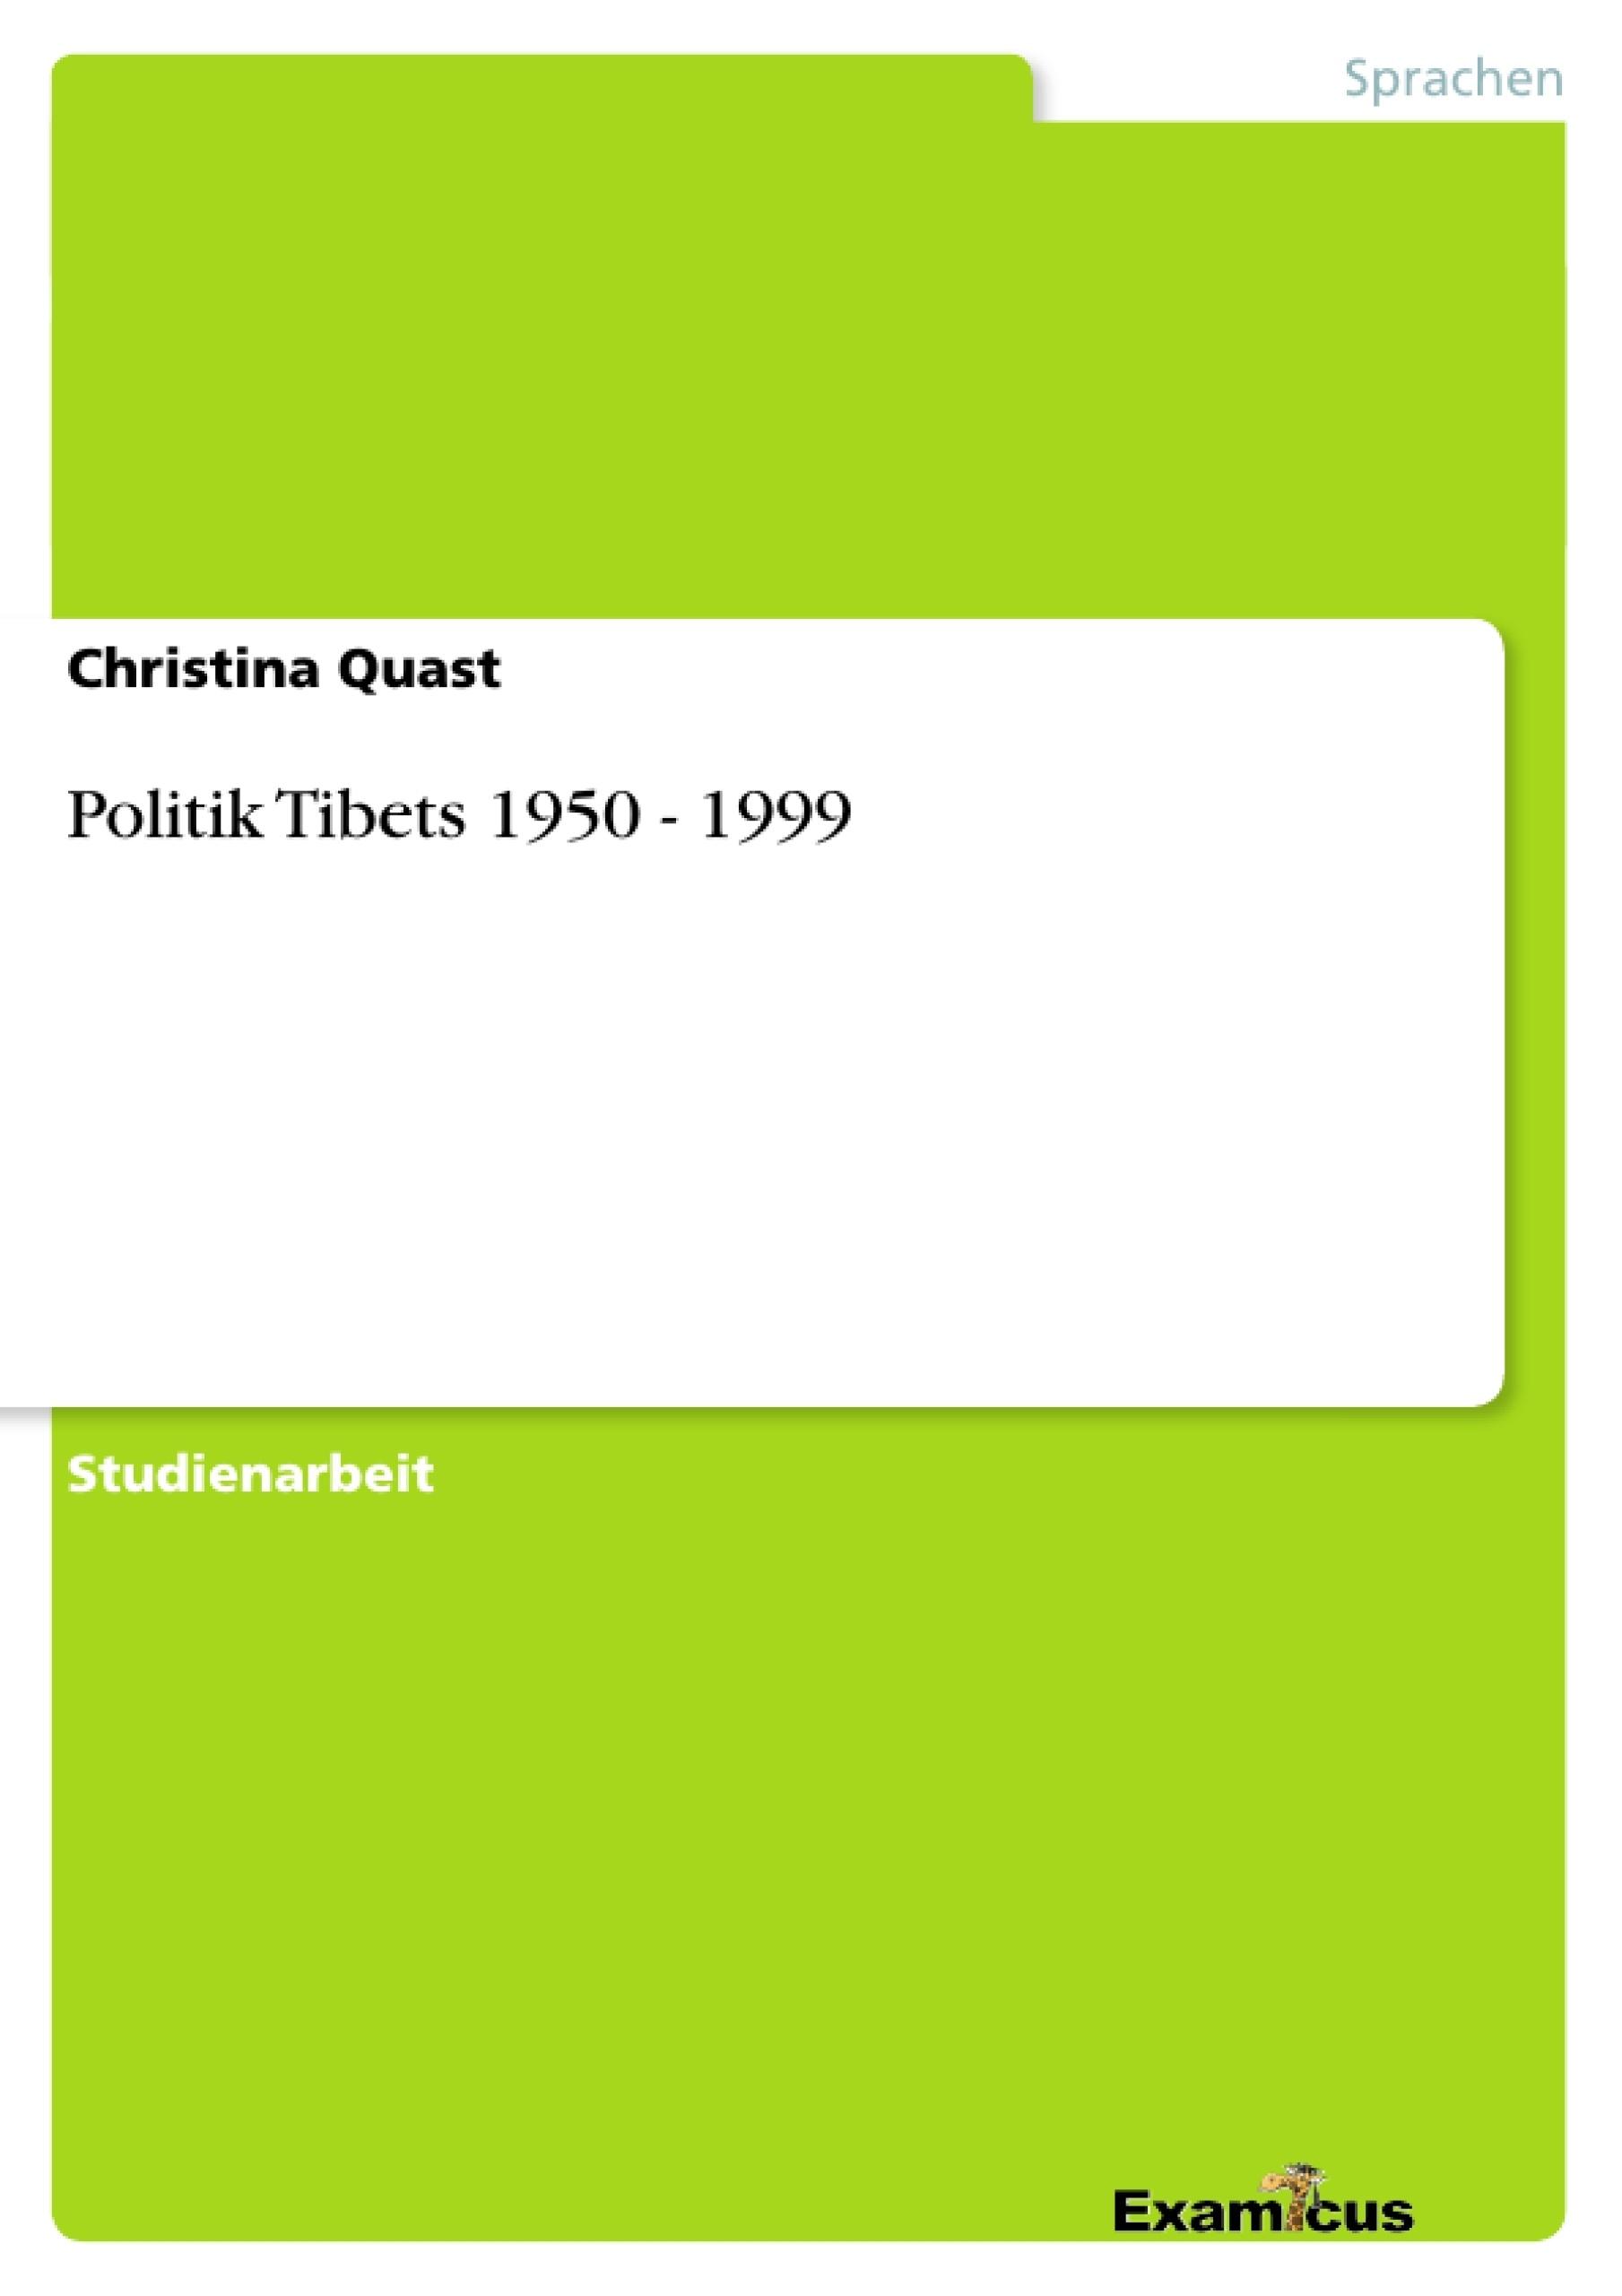 Titel: Politik Tibets 1950 - 1999